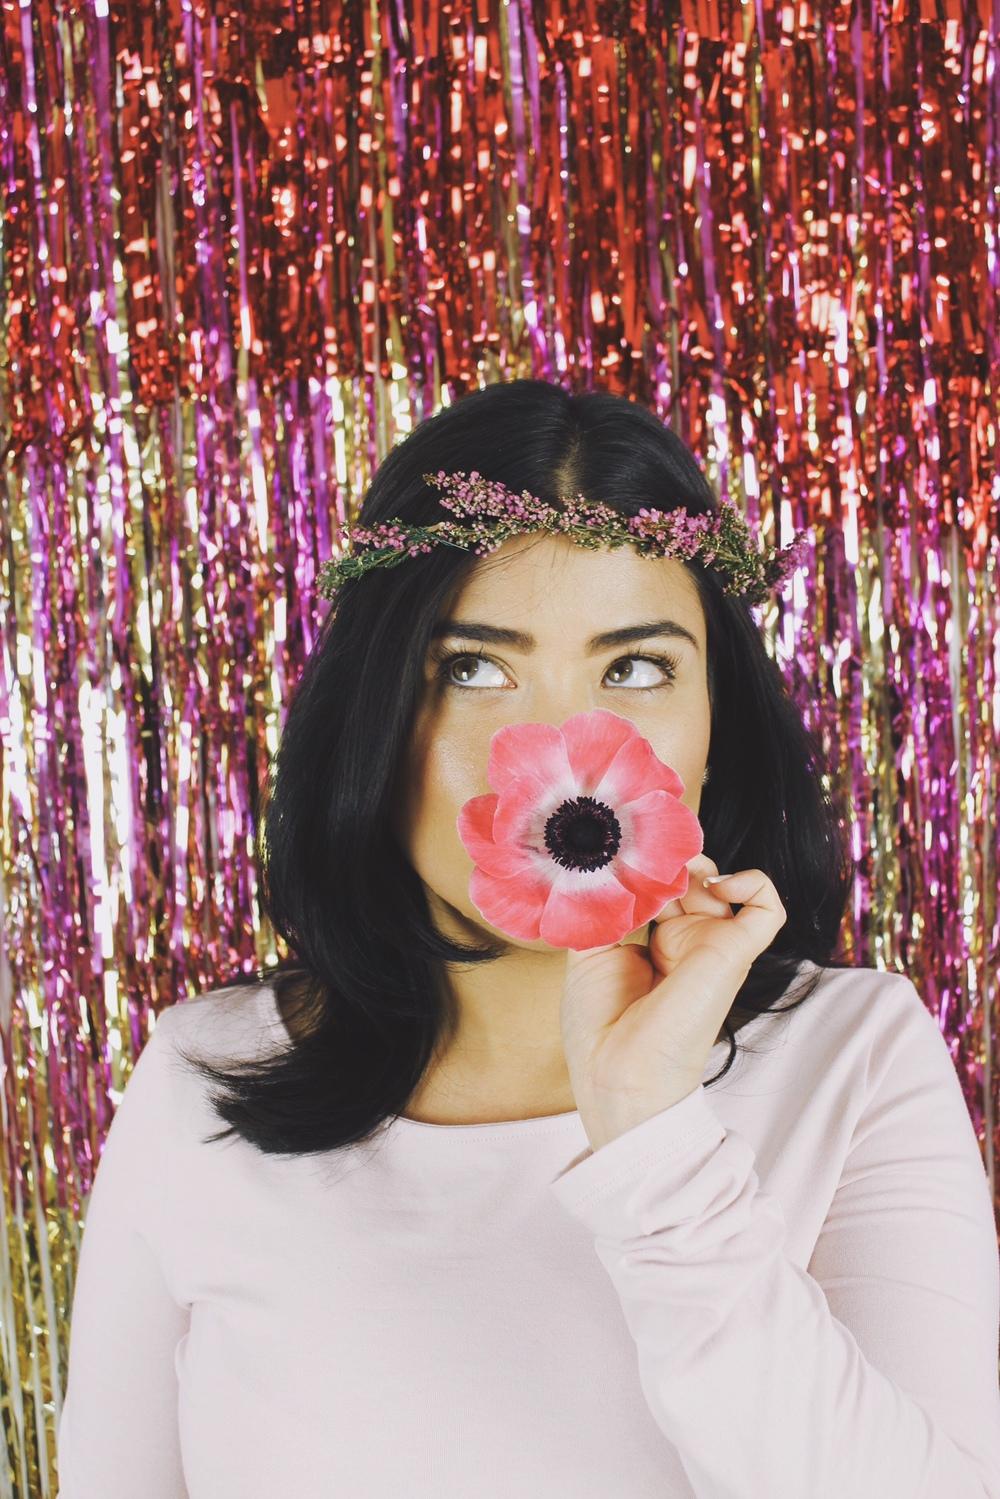 Heather-Crown-16-C.jpeg